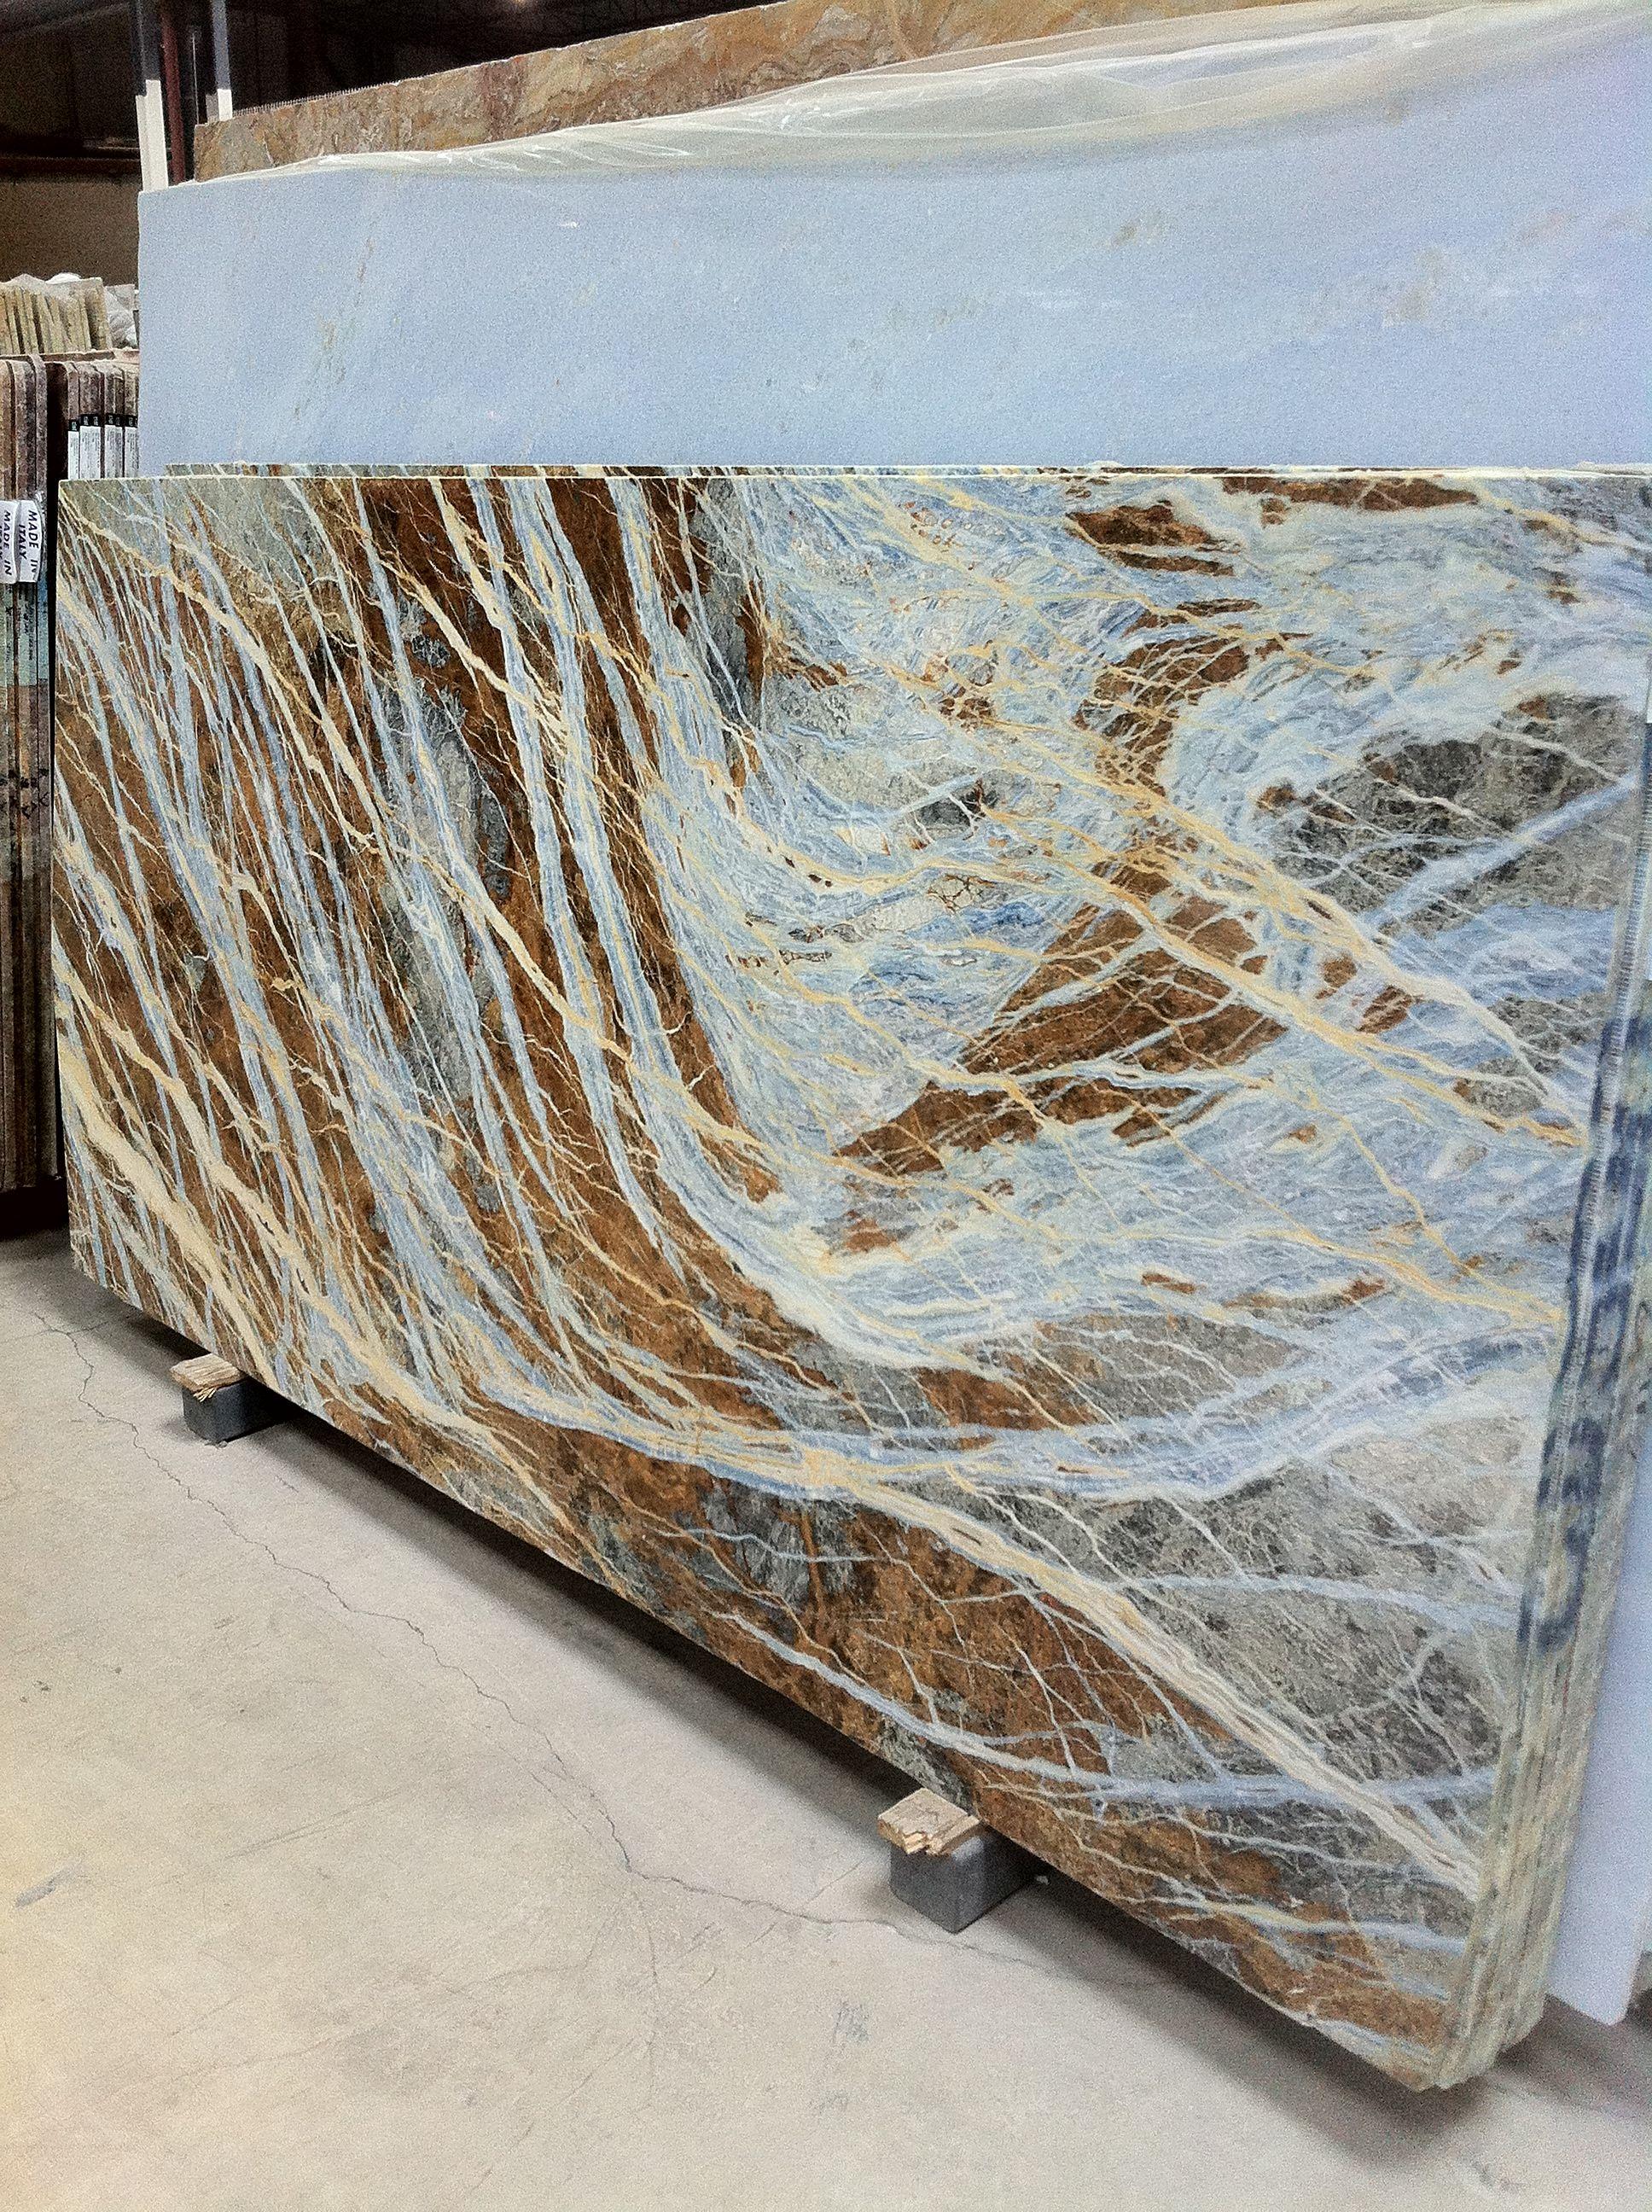 Blue Marble Slab : Blue jeans marble slab block quarry interior design